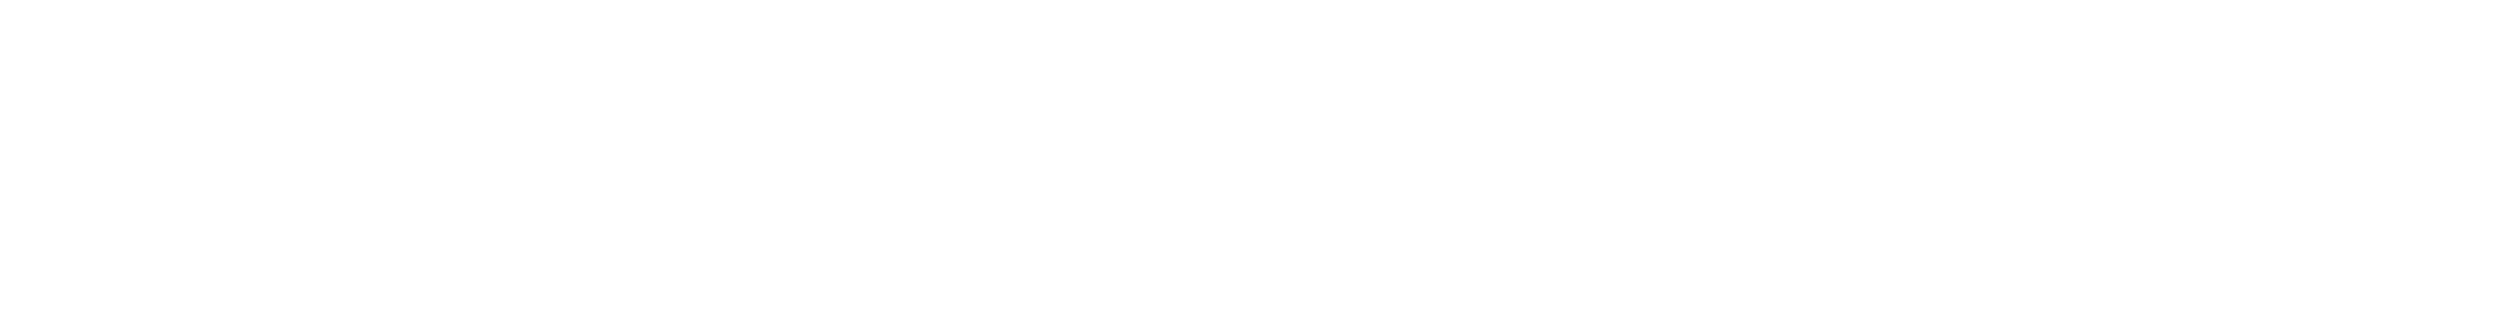 First National Real Estate Five Dock Drummoyne